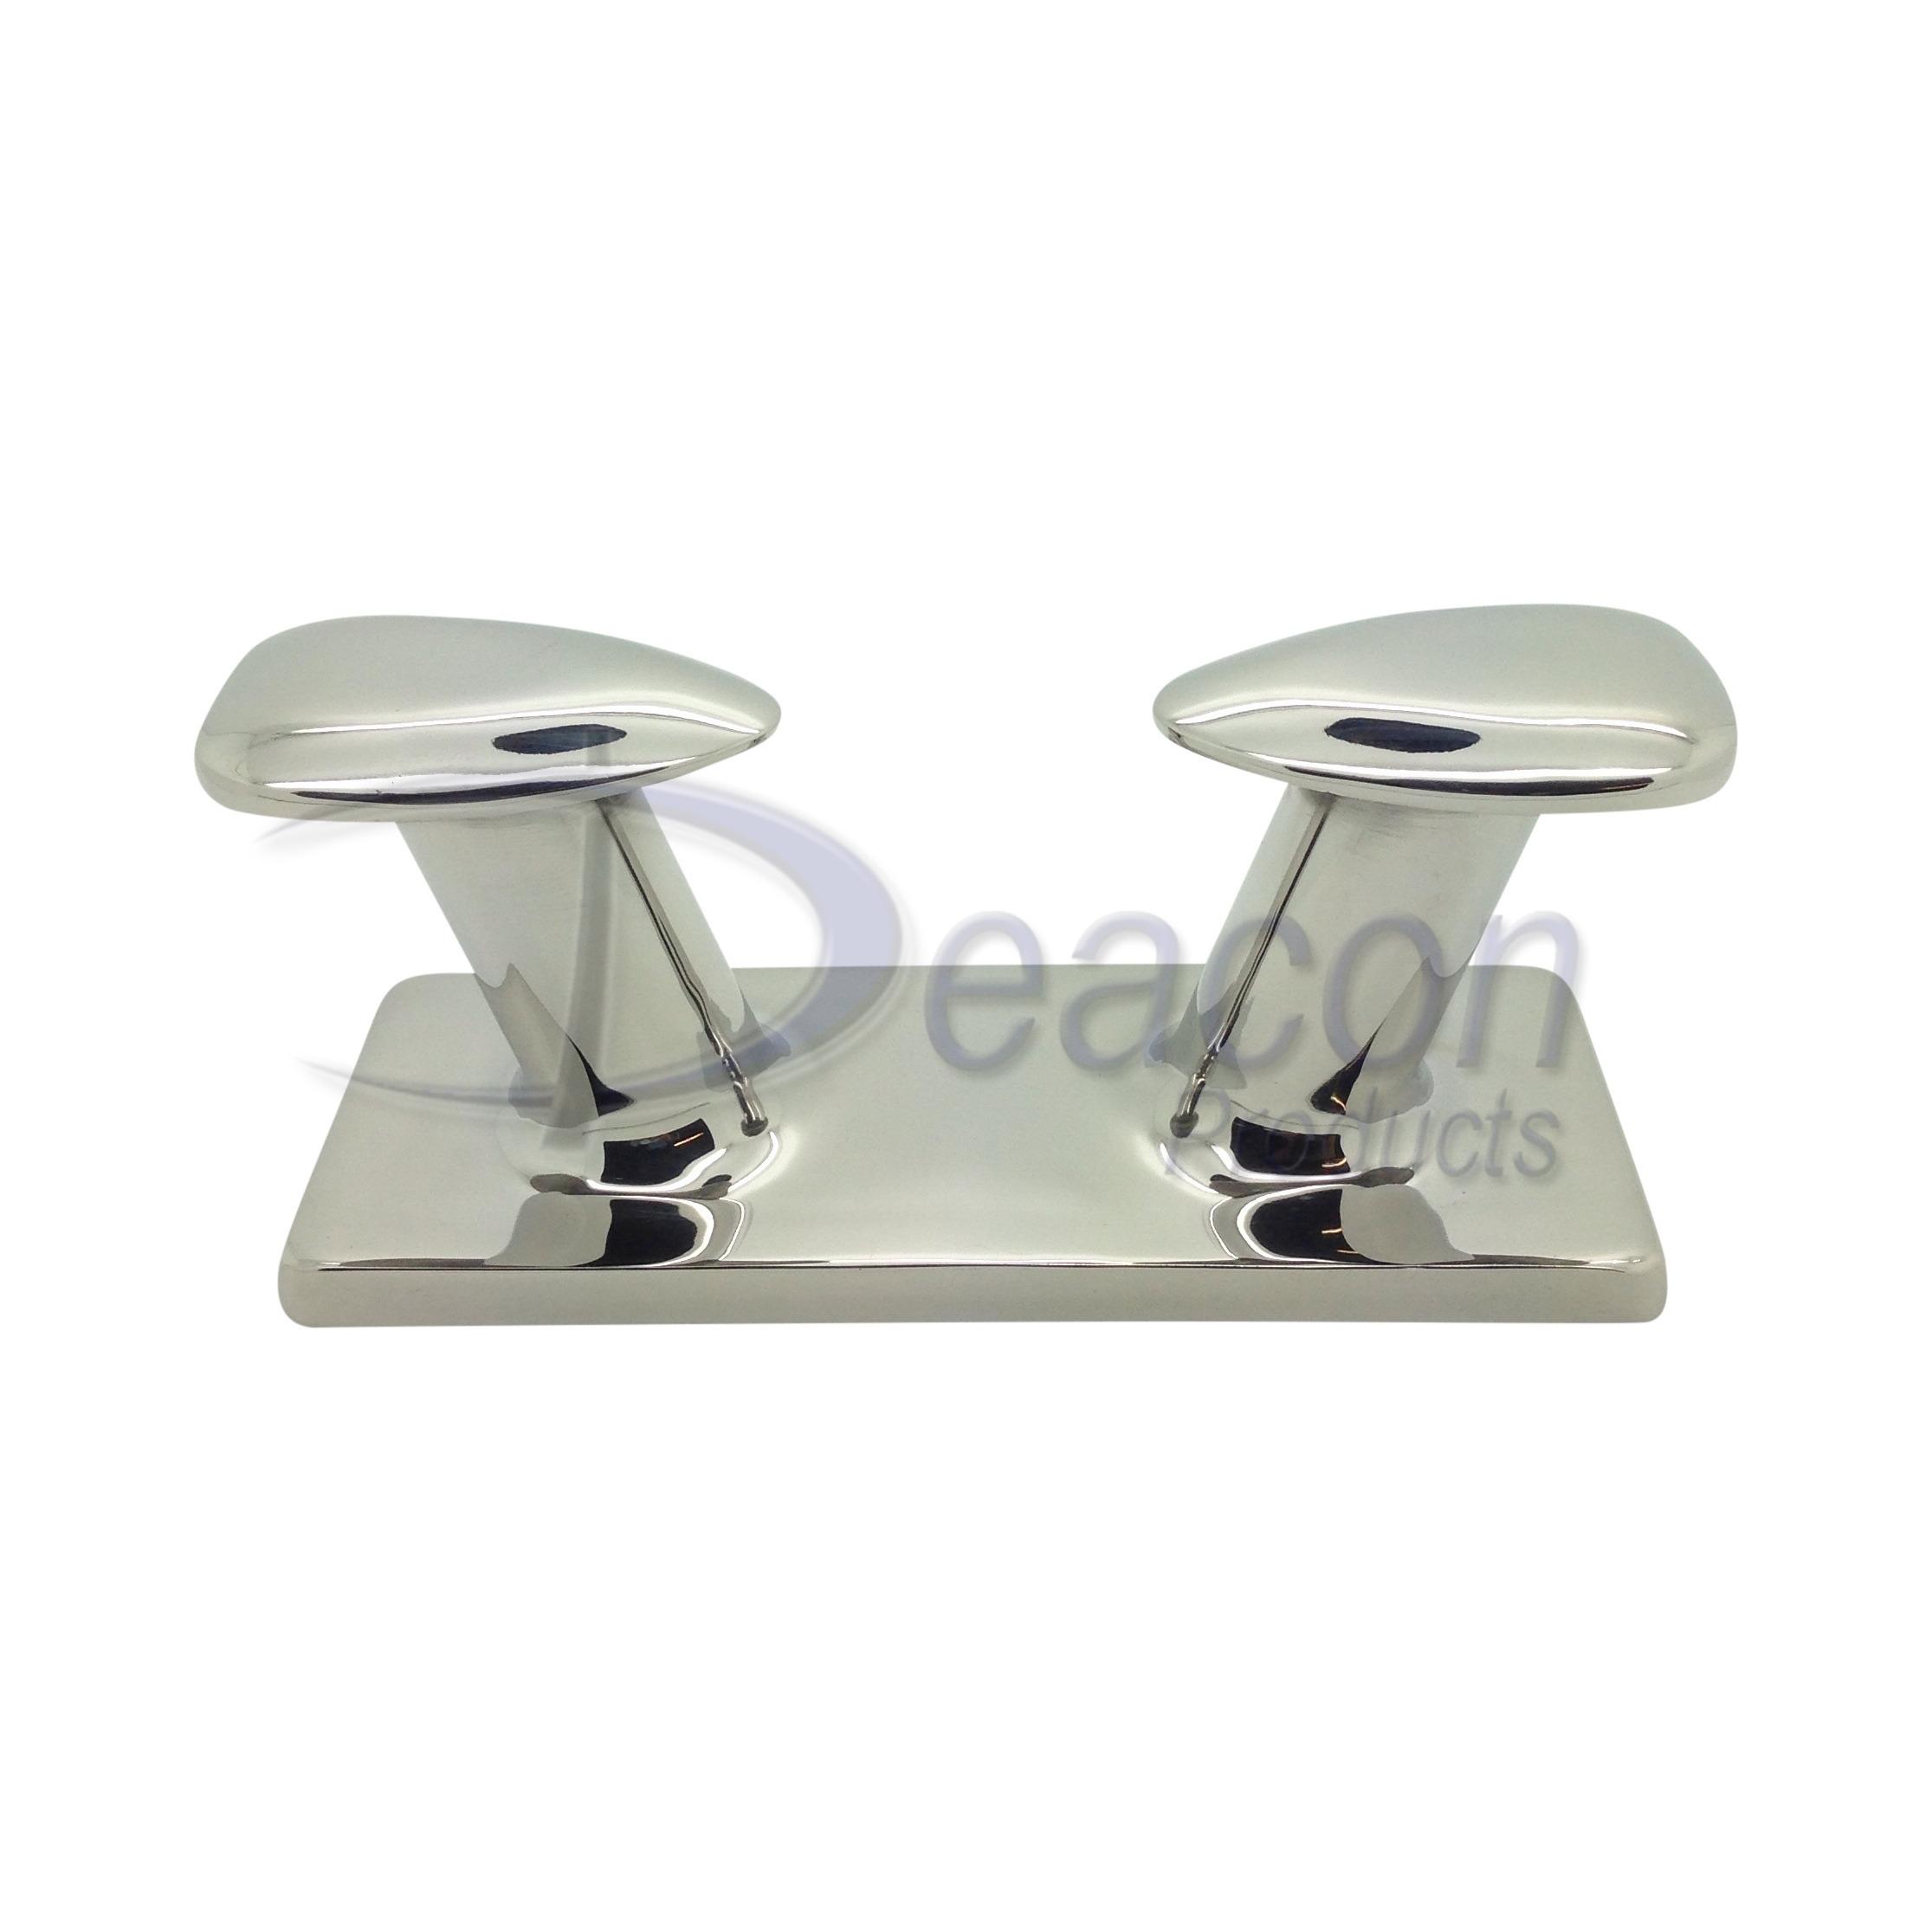 stainless-steel-horn-bollard-cleat